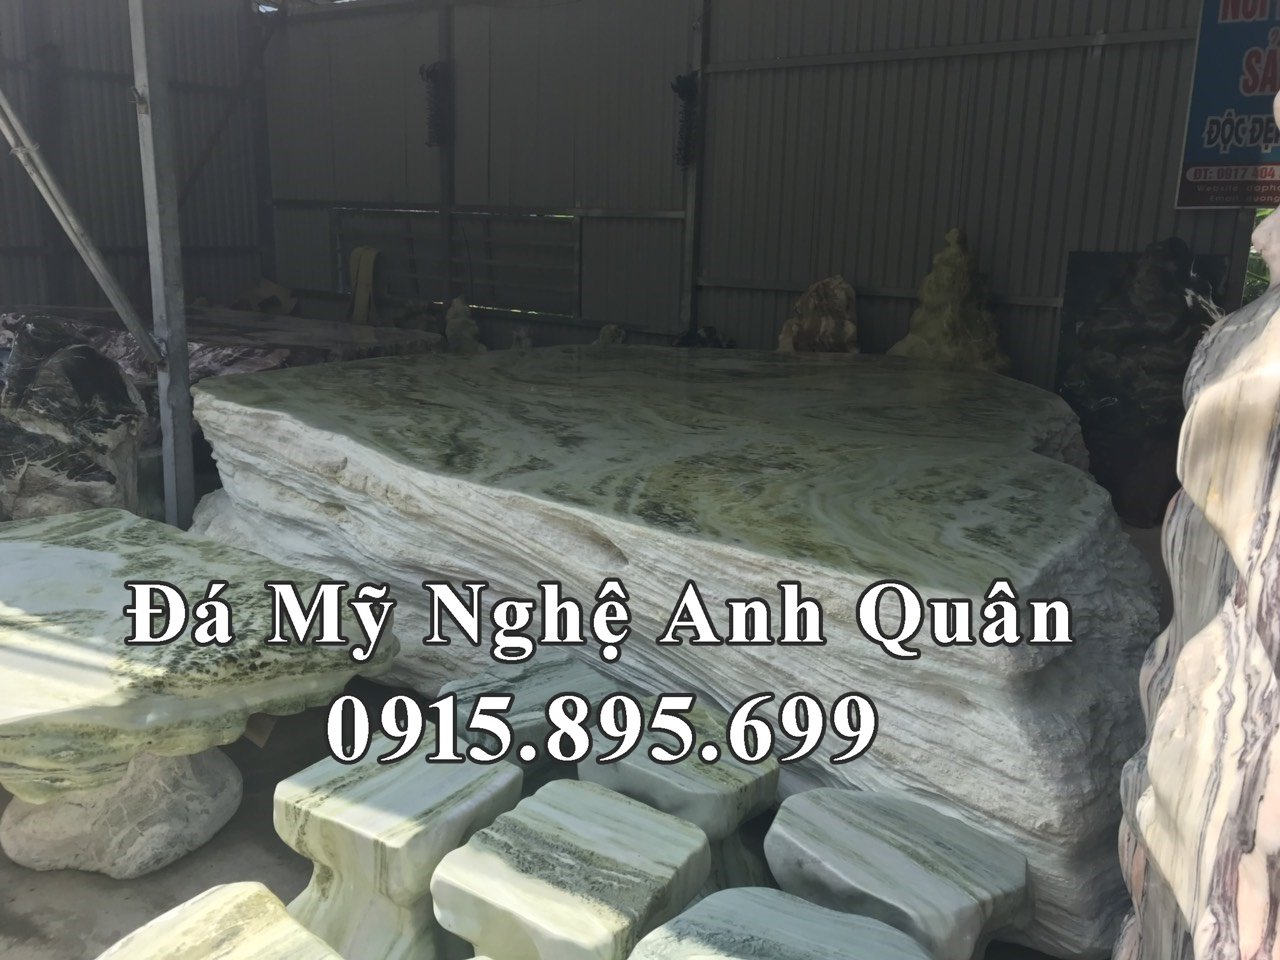 Ban-ghe-da-dep-Anh-Quan-Ninh-Binh.jpg